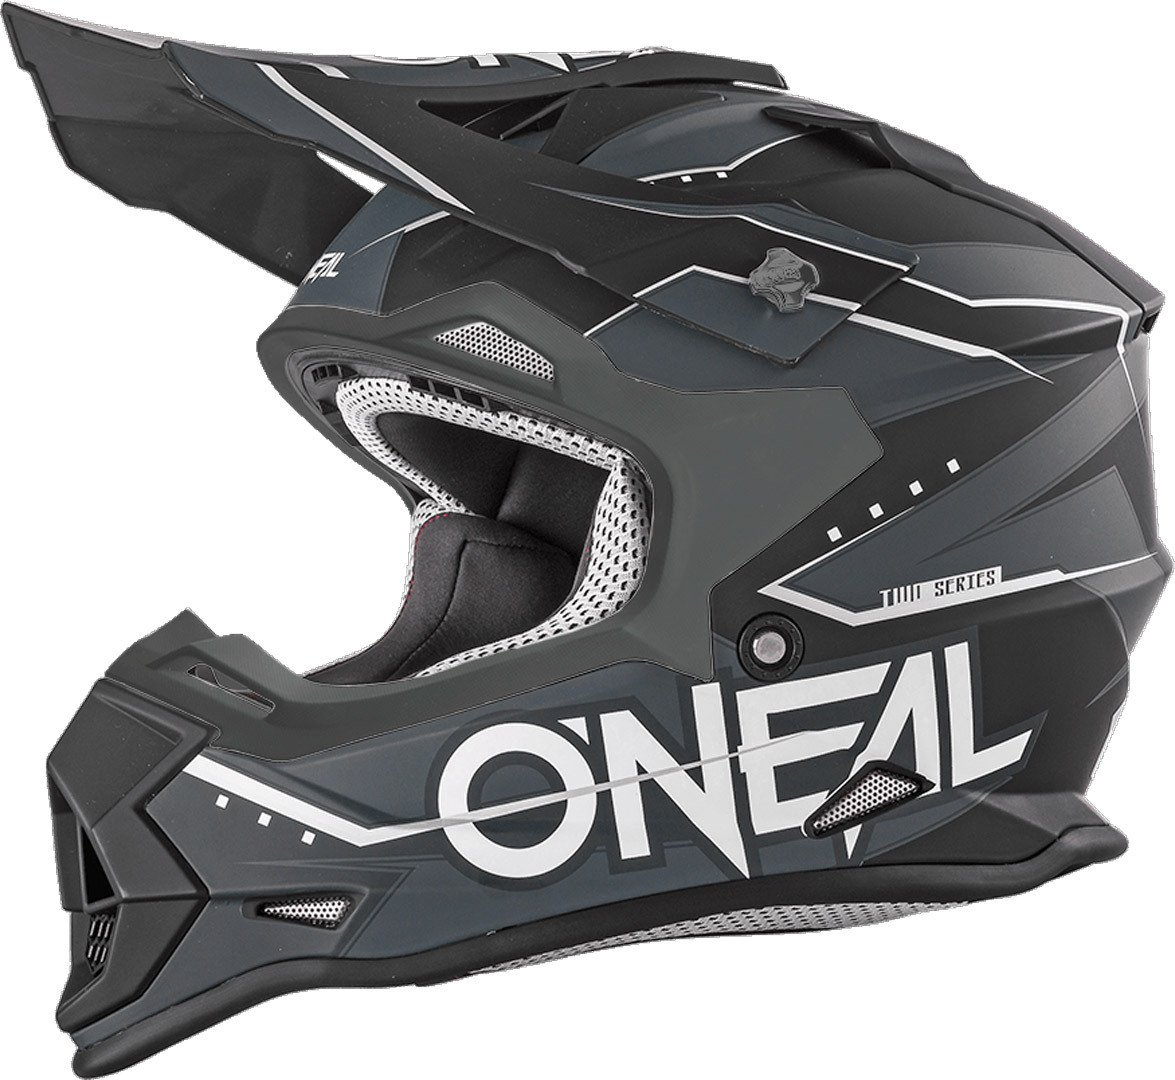 ONeal 2Series Bambini Casco MX Slingshot Schwarz Moto Cross Enduro Quad Fuoristrada DH 0200-86